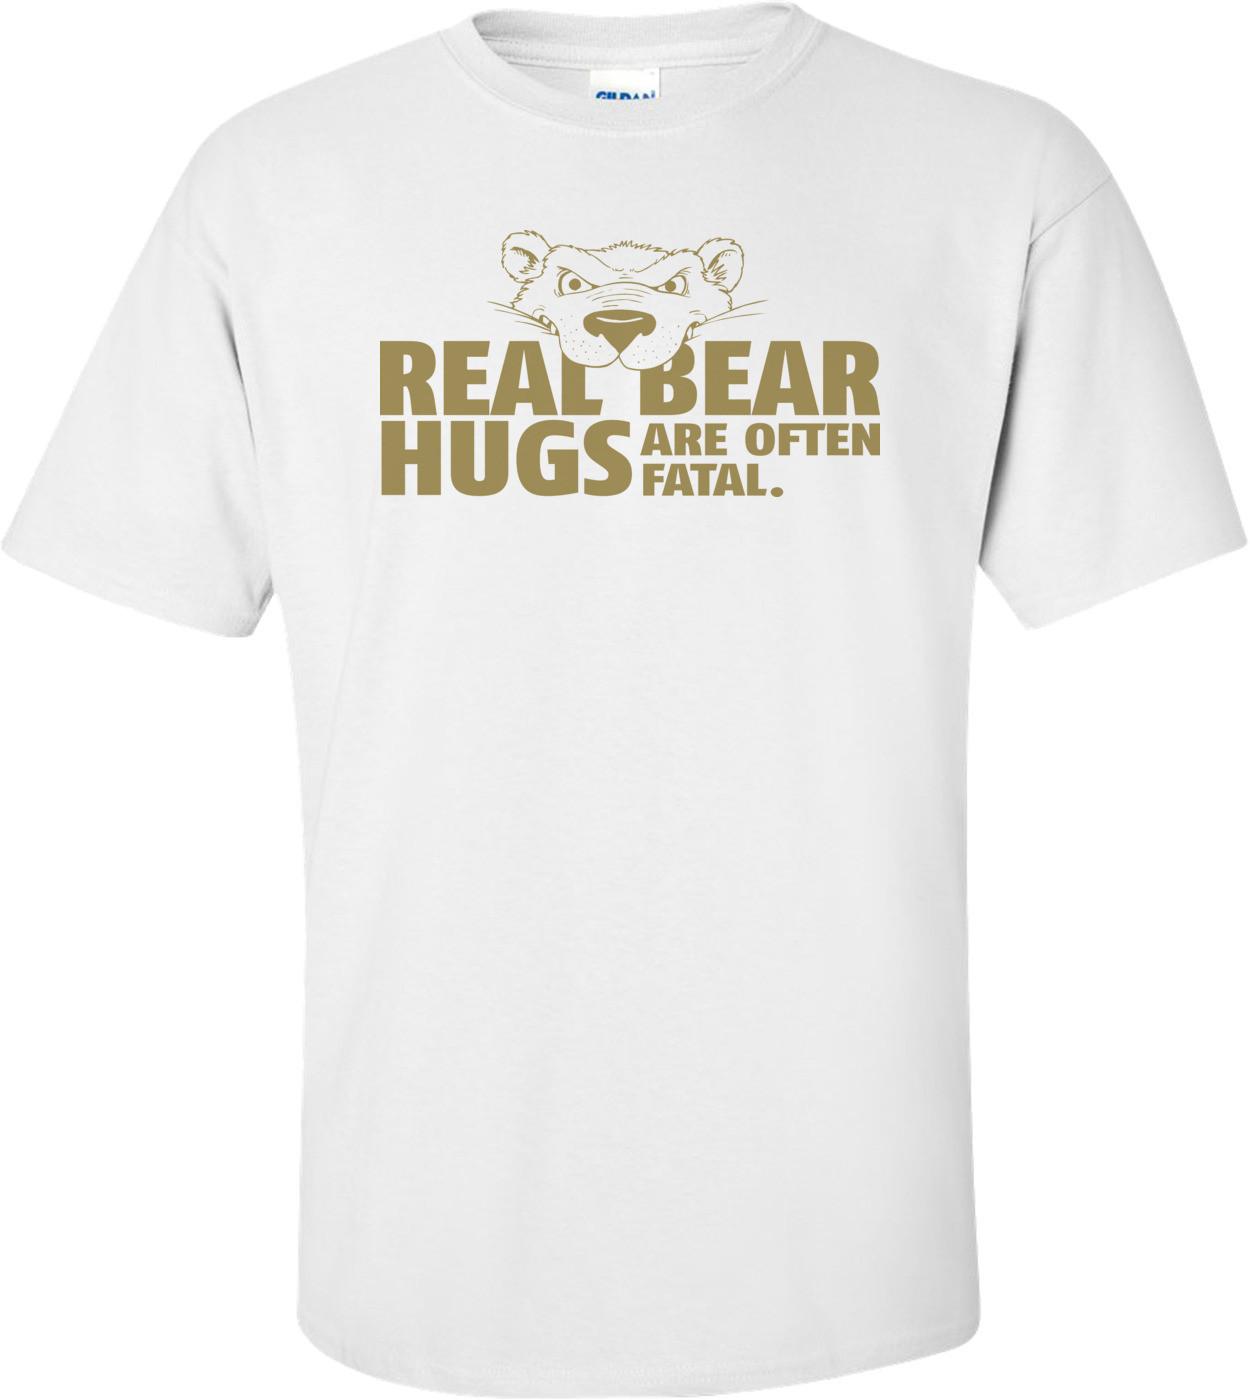 Real Bear Hugs Are Often Fatal T-shirt